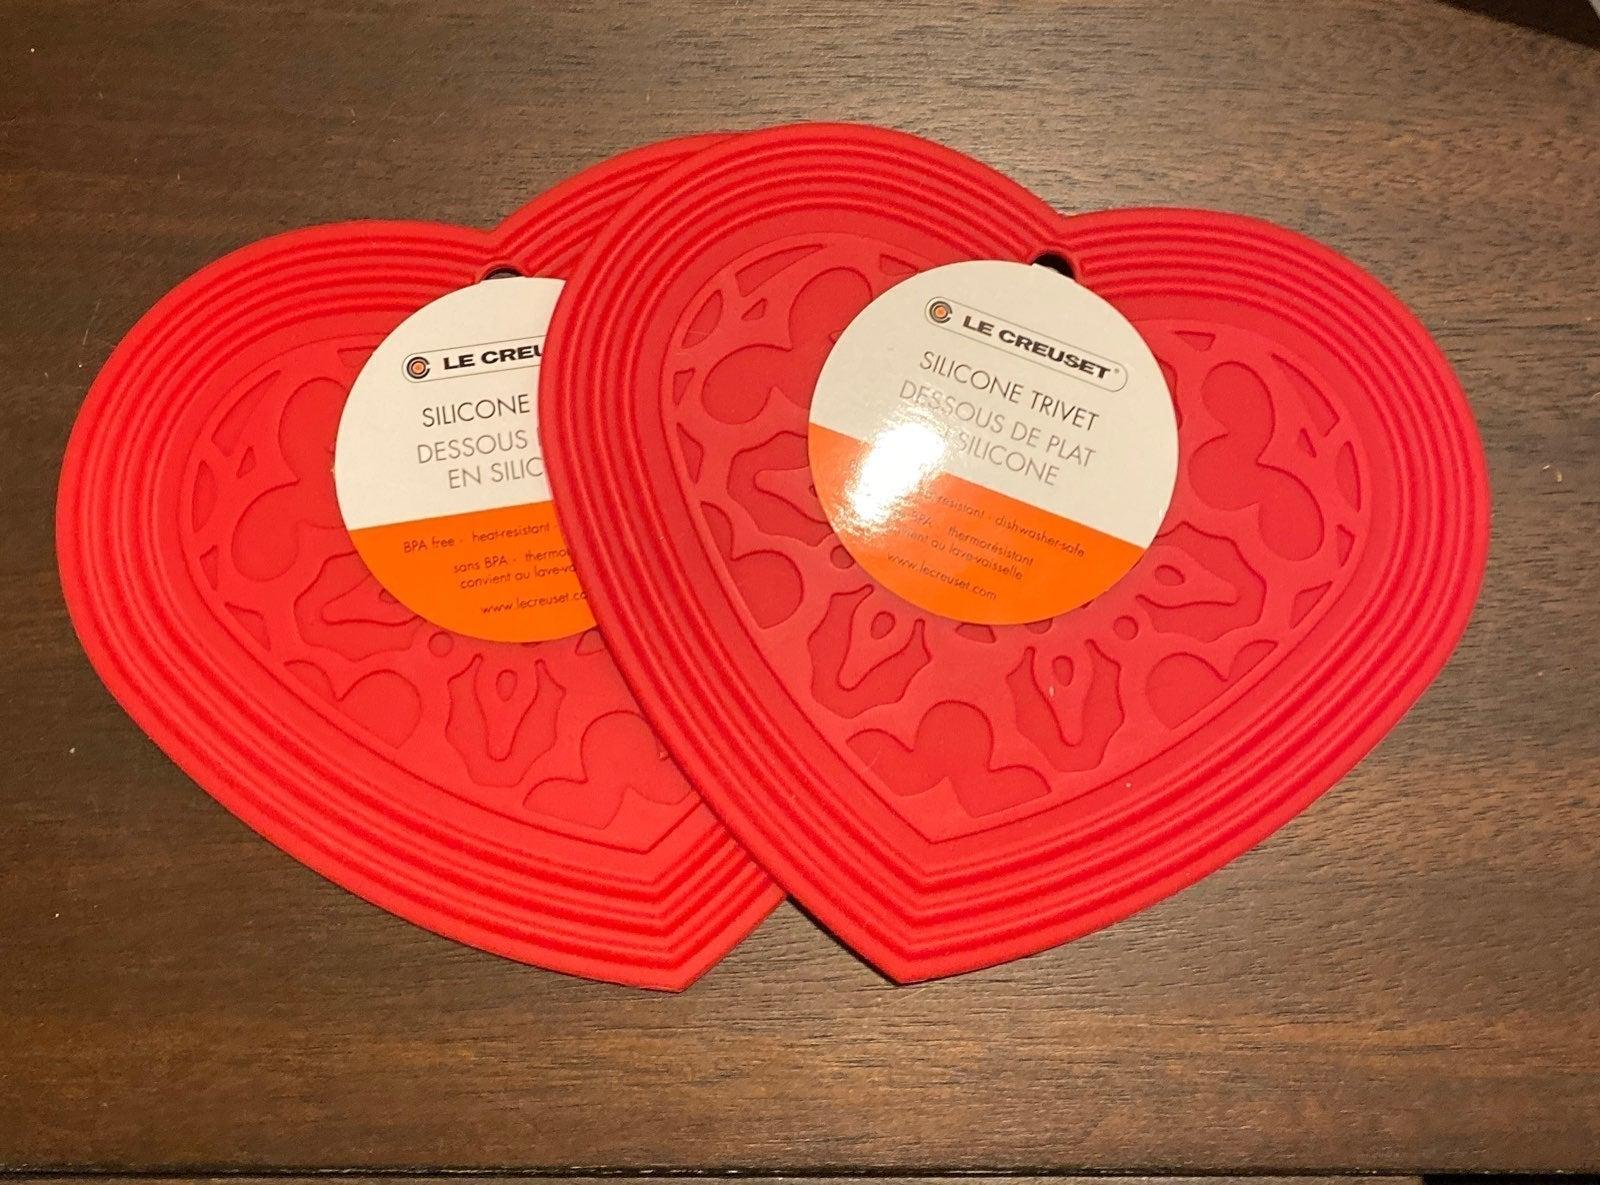 Le Creuset Heart shaped silicone trivet